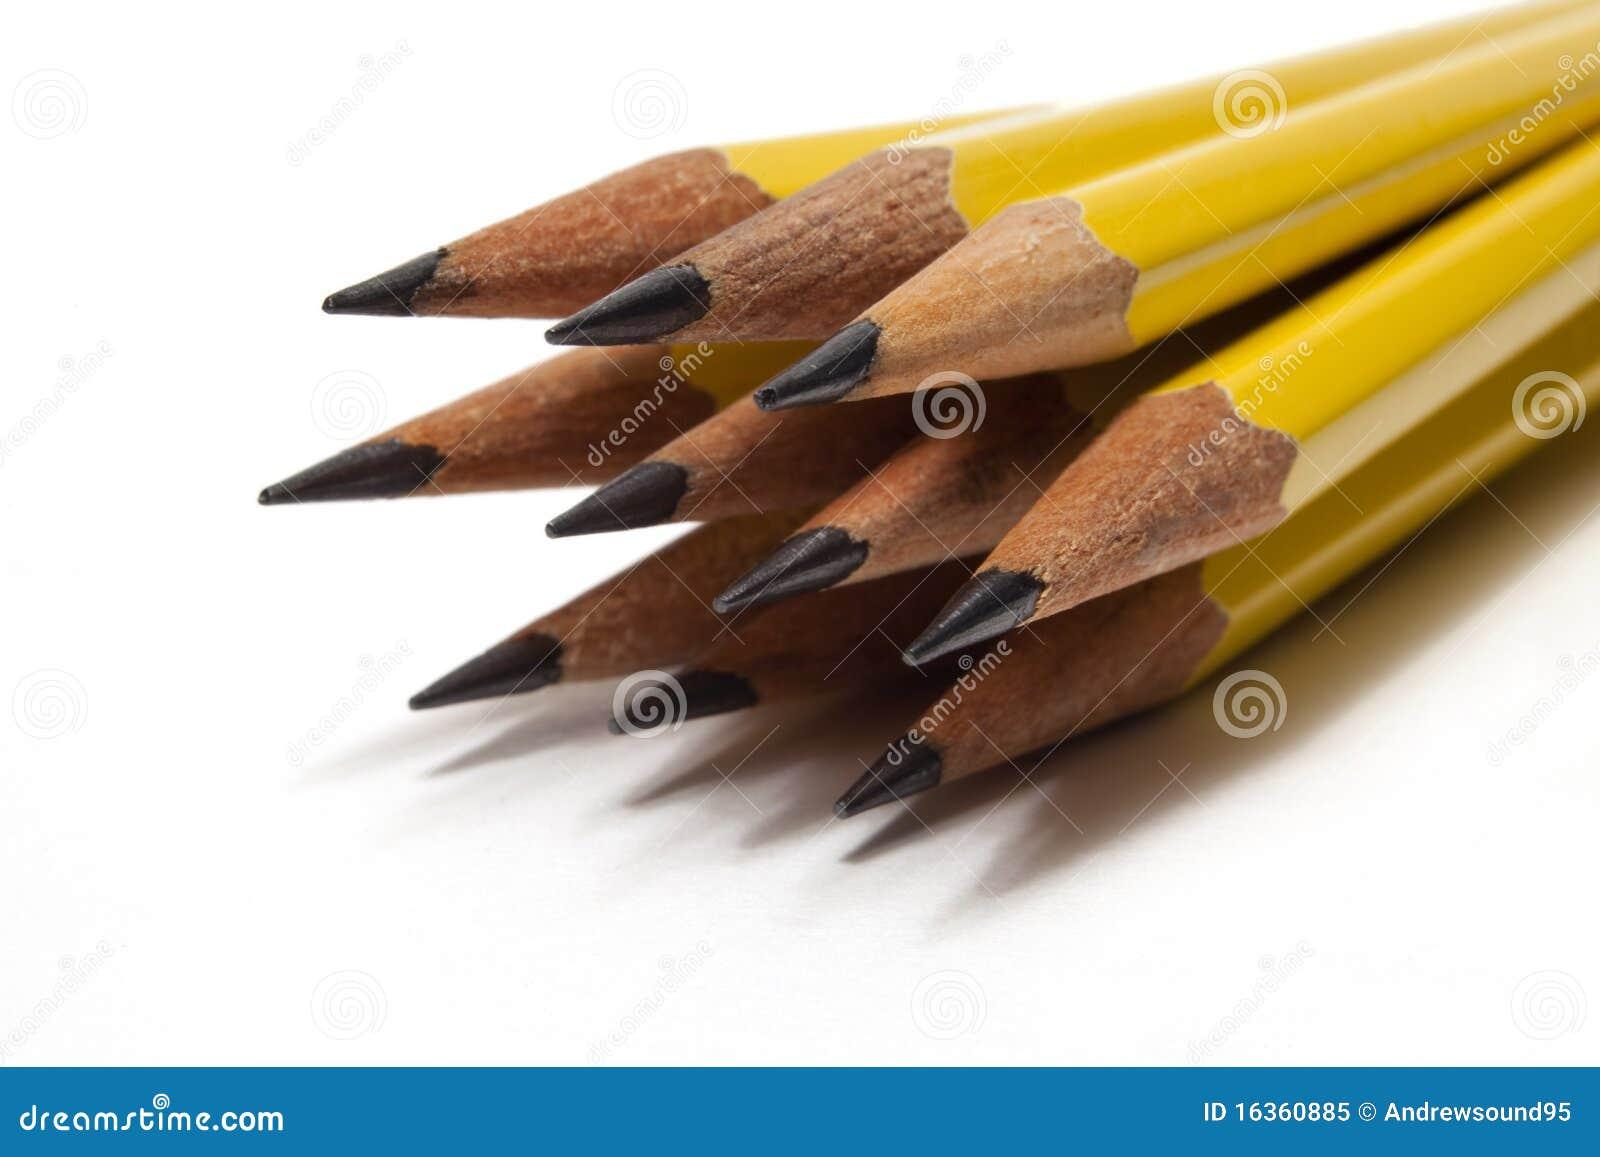 Several Sharpened Pencils